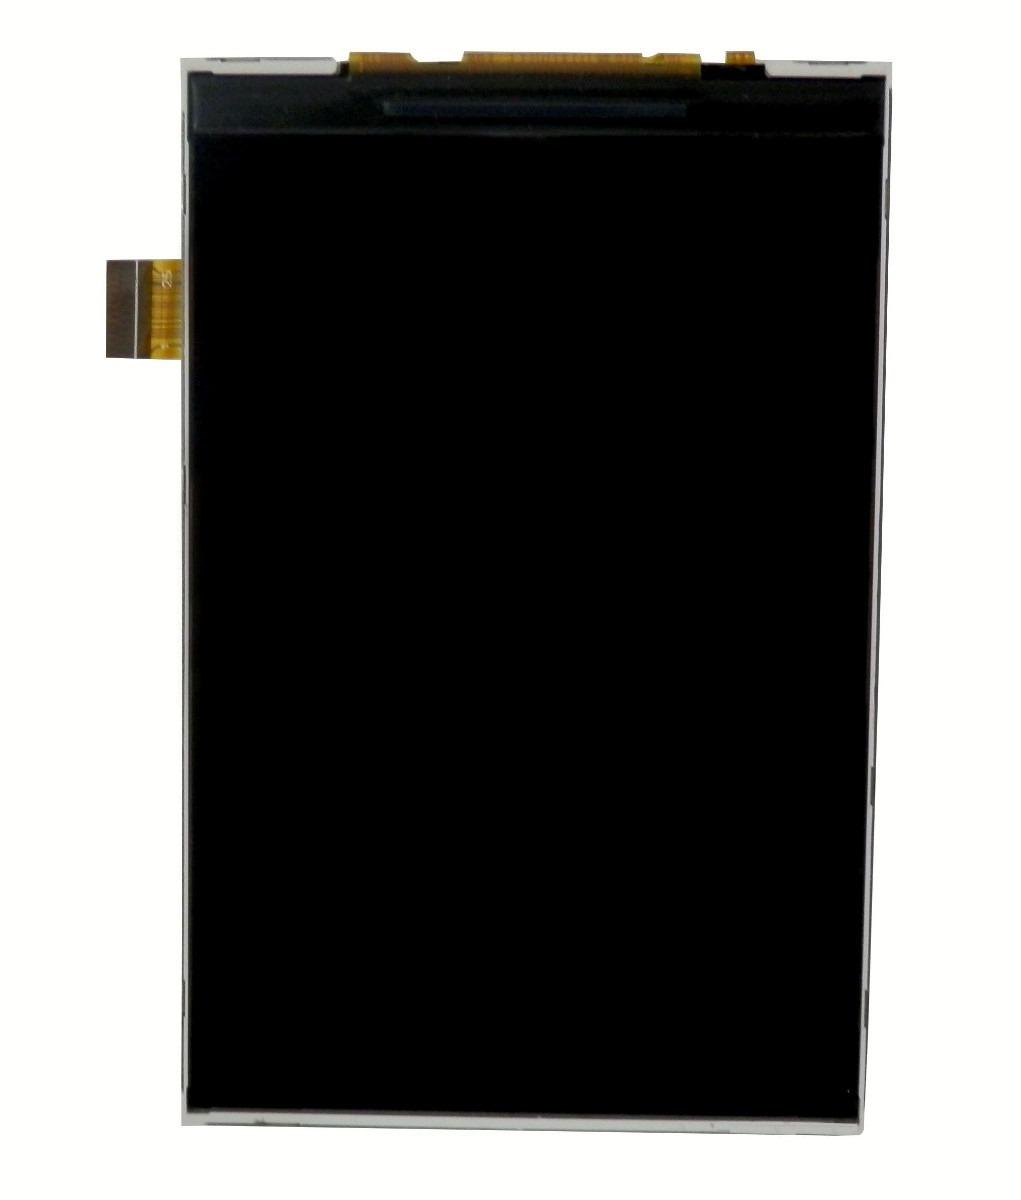 Lcd Display Alcatel One Touch Ot4010 A Ot 4030 A Original